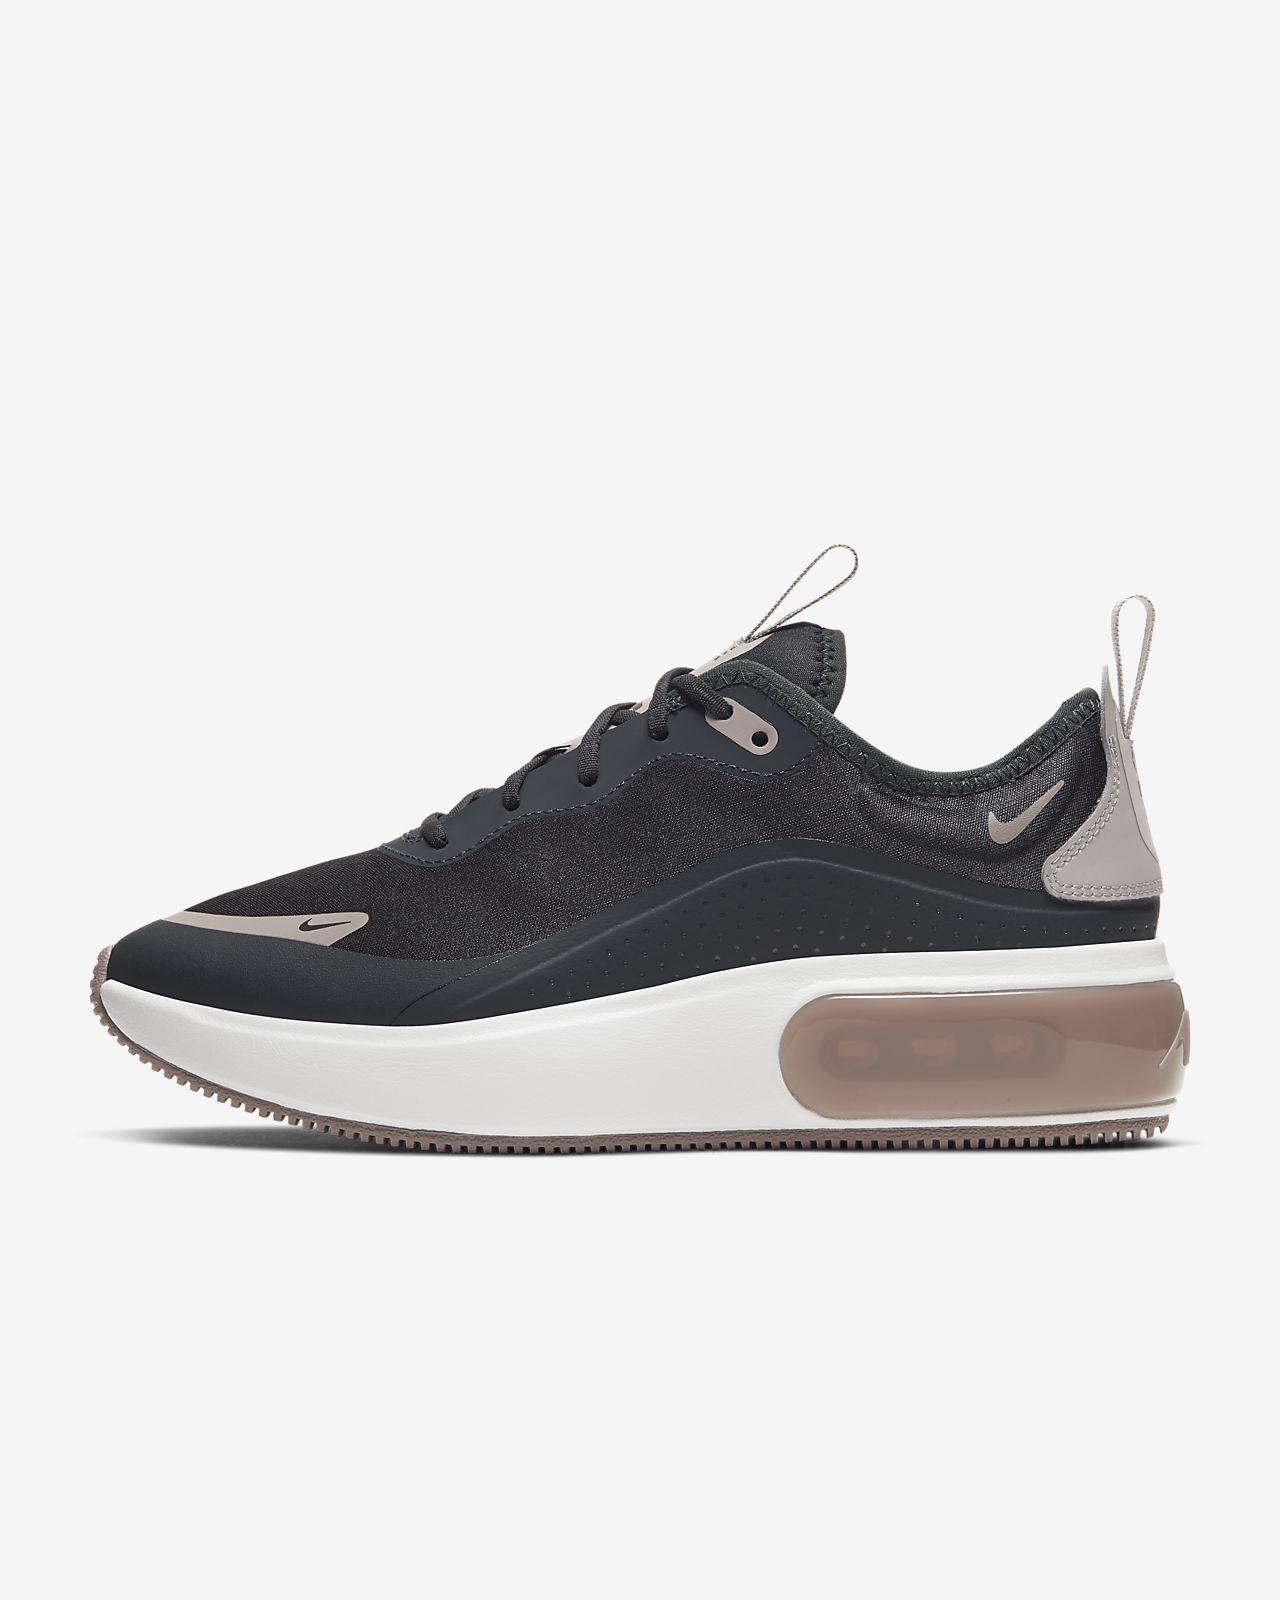 Nike Air Max Dia Shoe